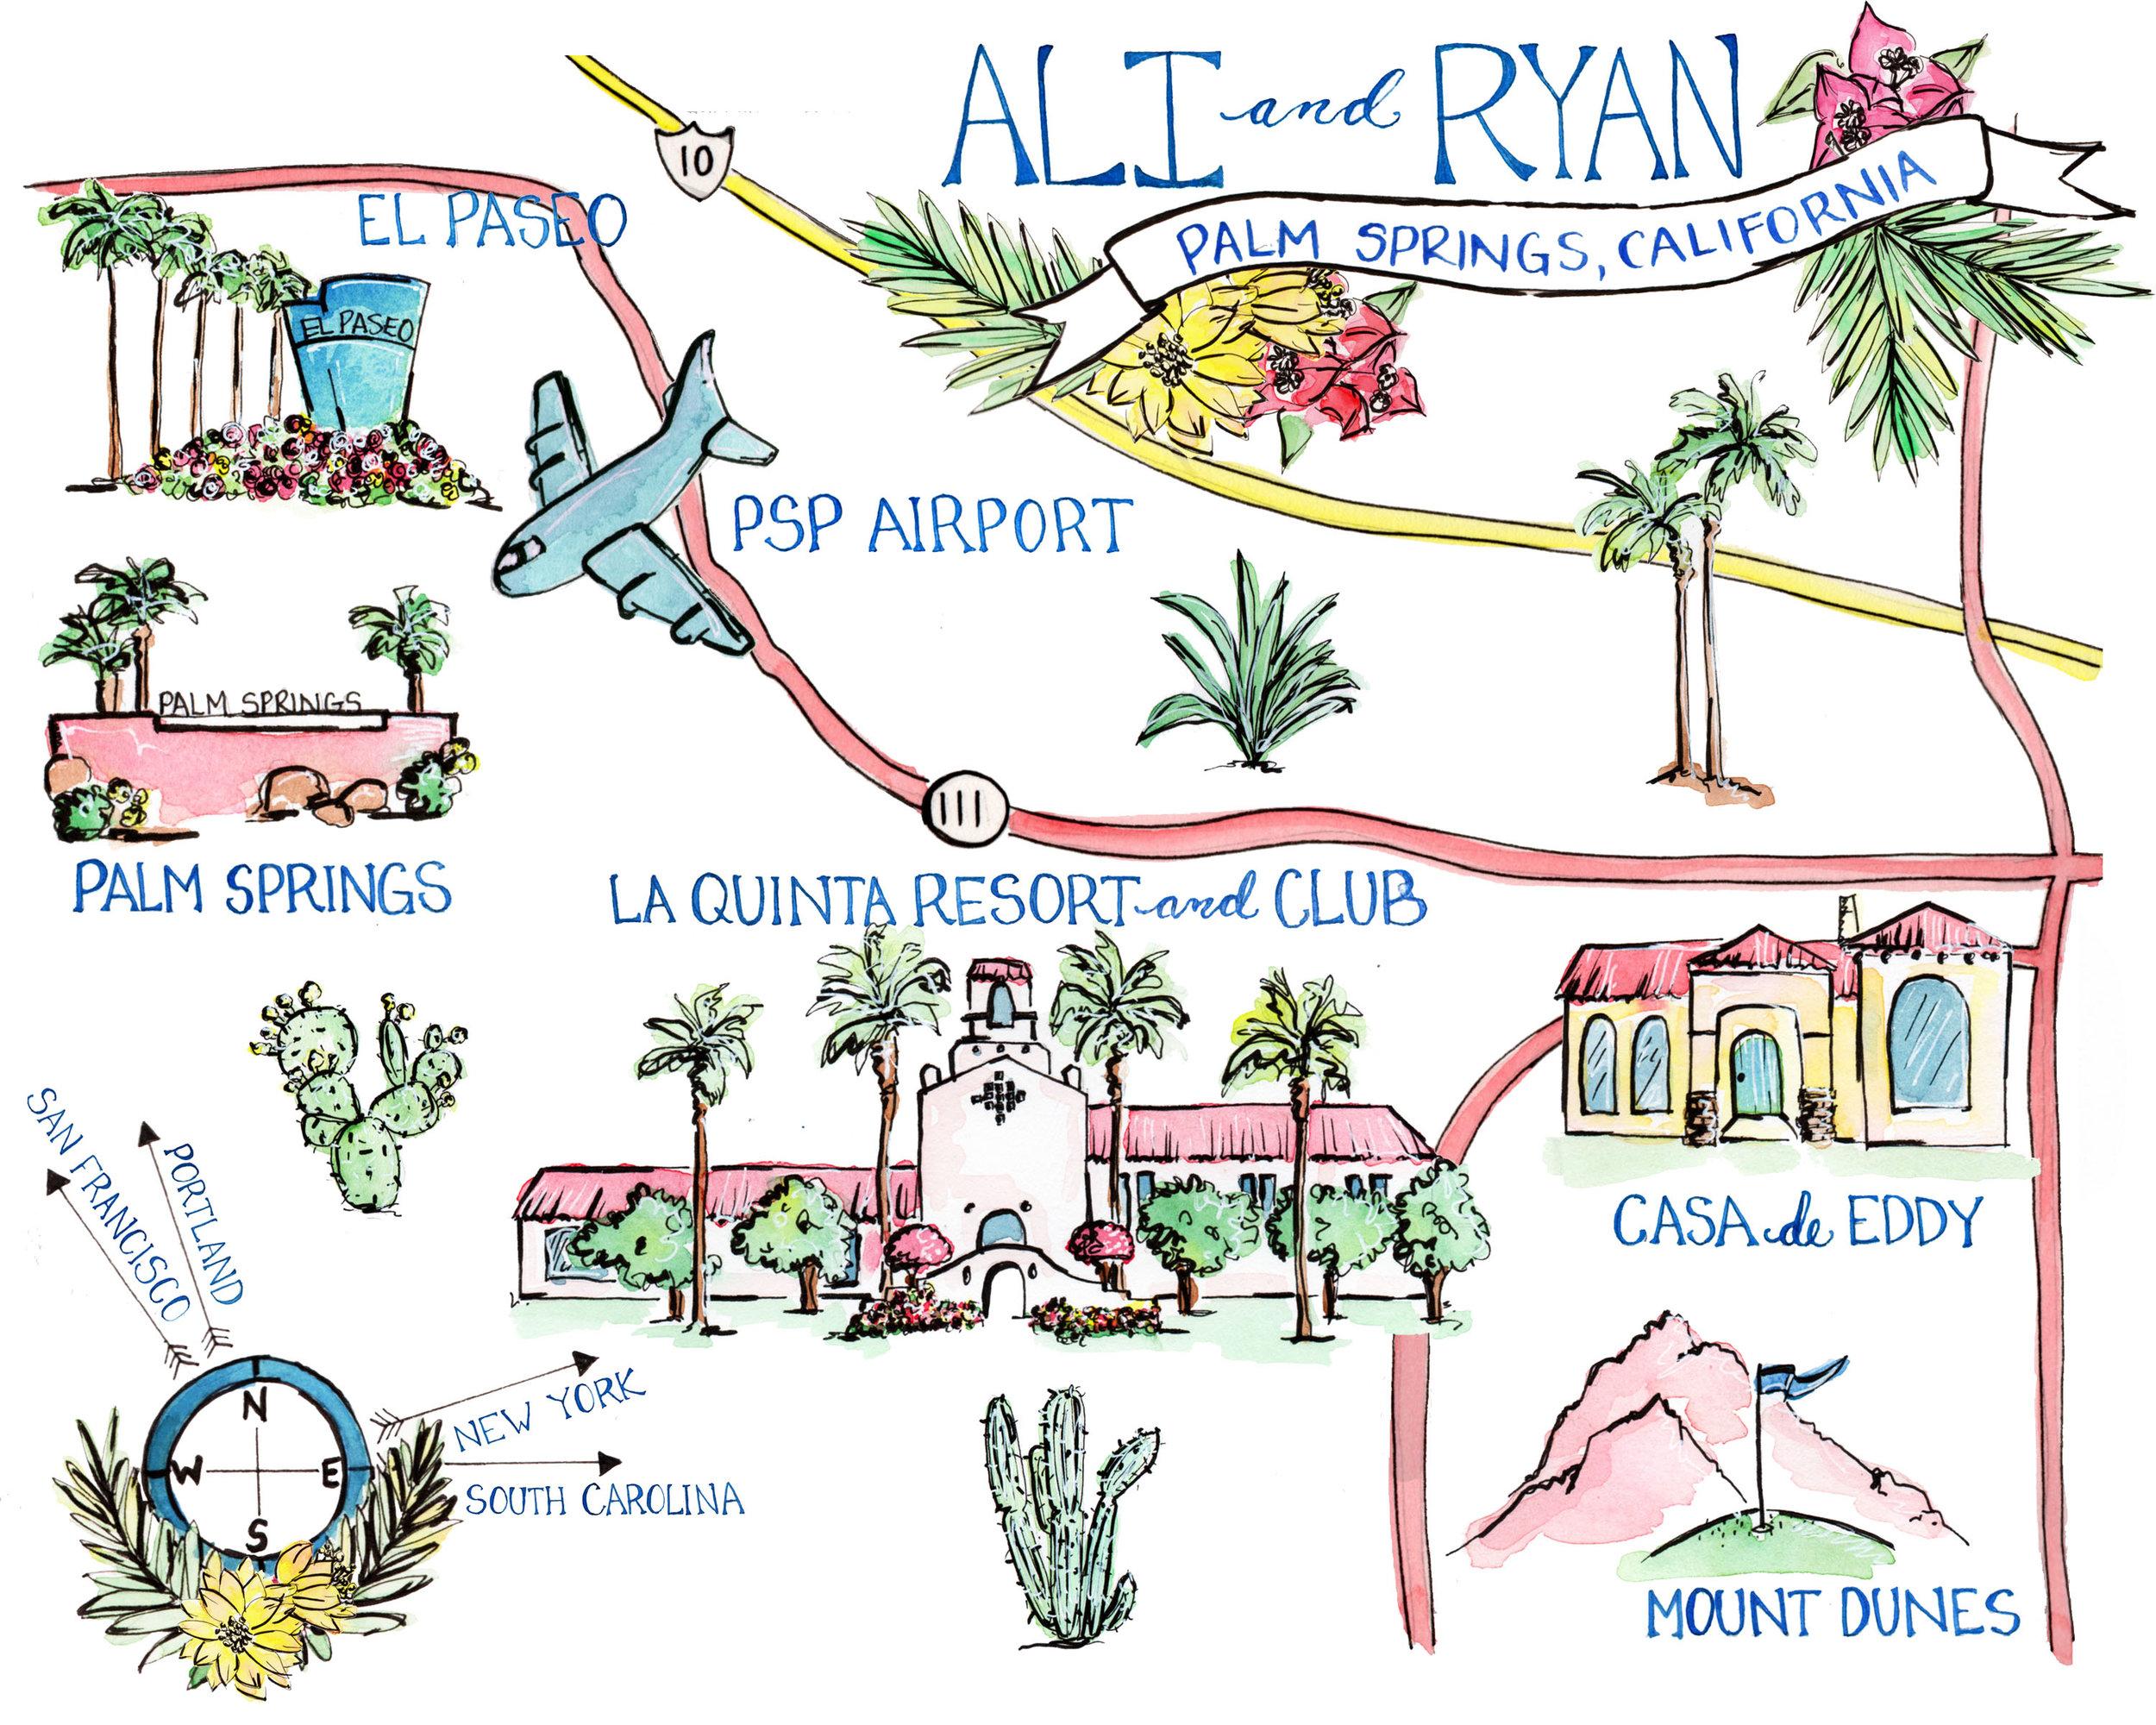 Ali and Ryan Palm Springs Map PROOF#1.jpg